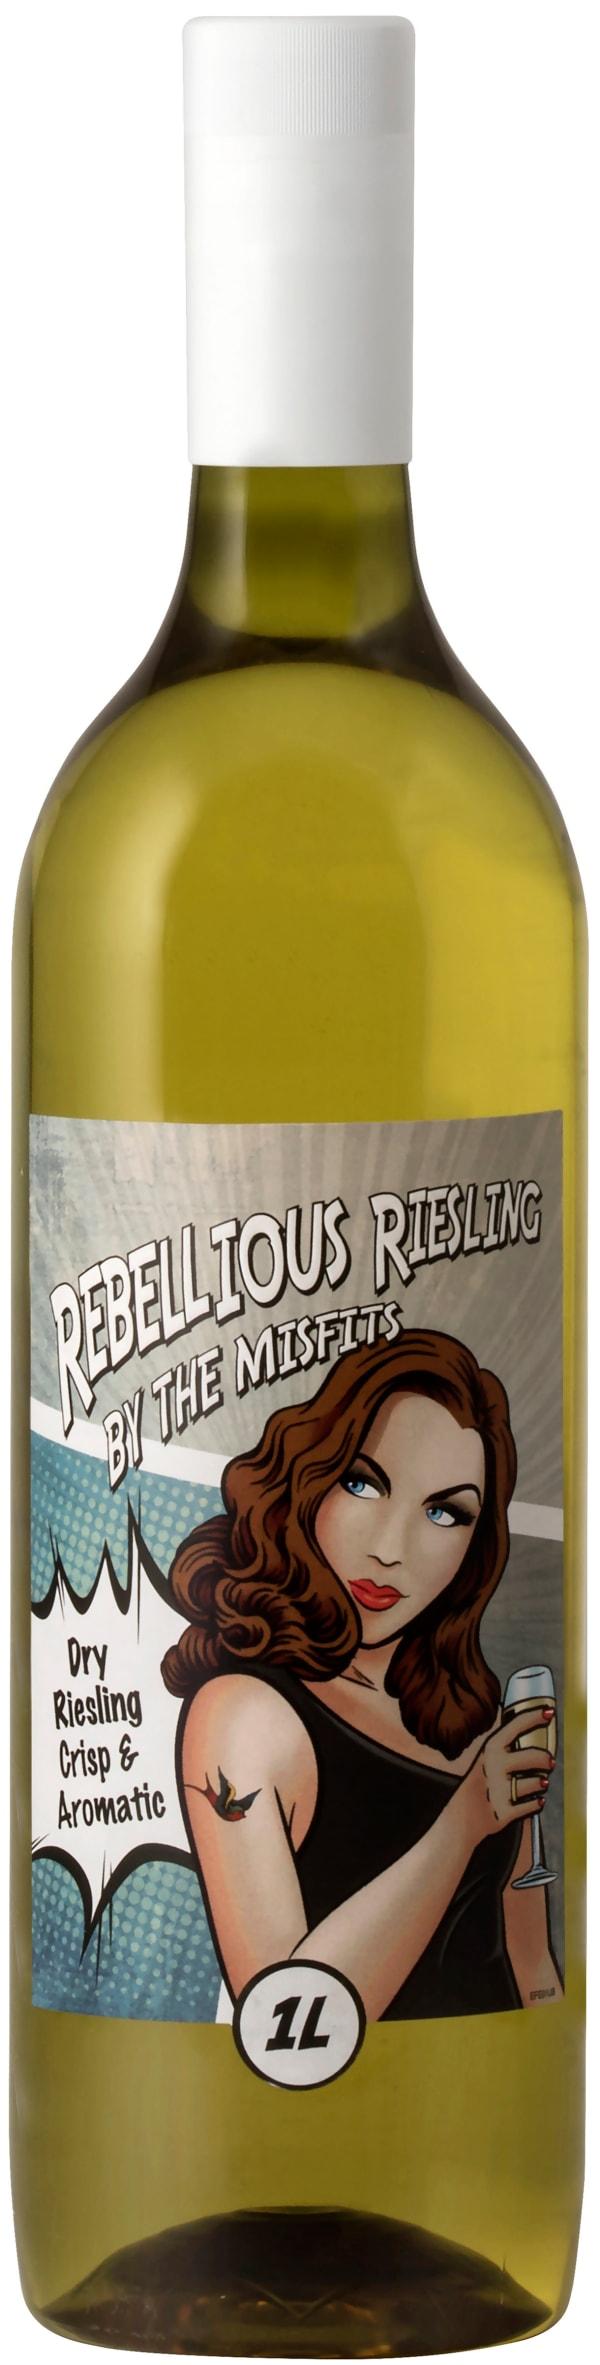 Rebellious Riesling plastic bottle